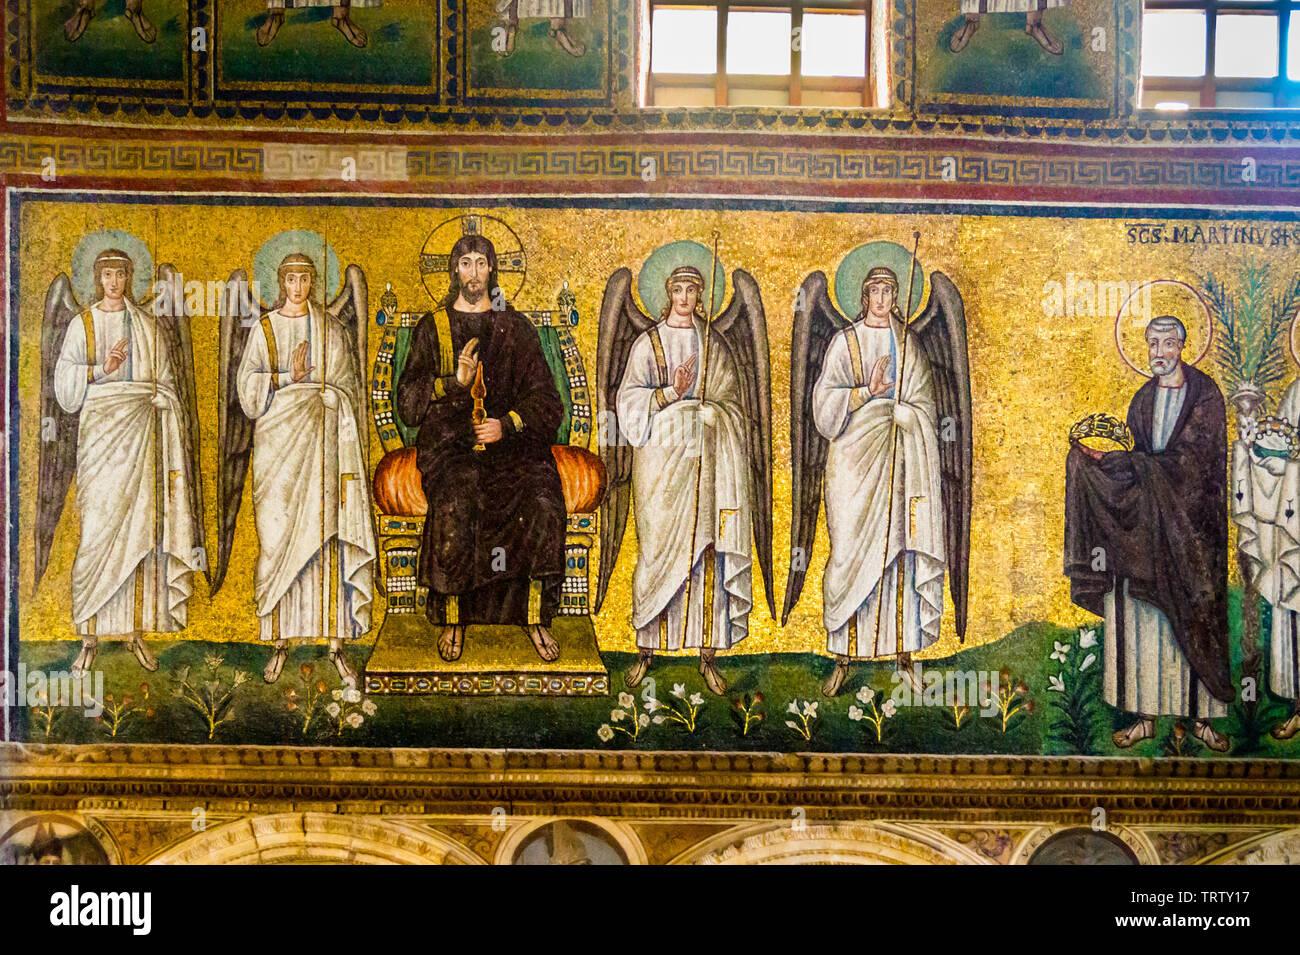 Mosaics of Christ and vanguard angels, church of Sant'Apollinare Nuovo, c 500AD, Ravenna, Emilia-Romagna, Italy Stock Photo